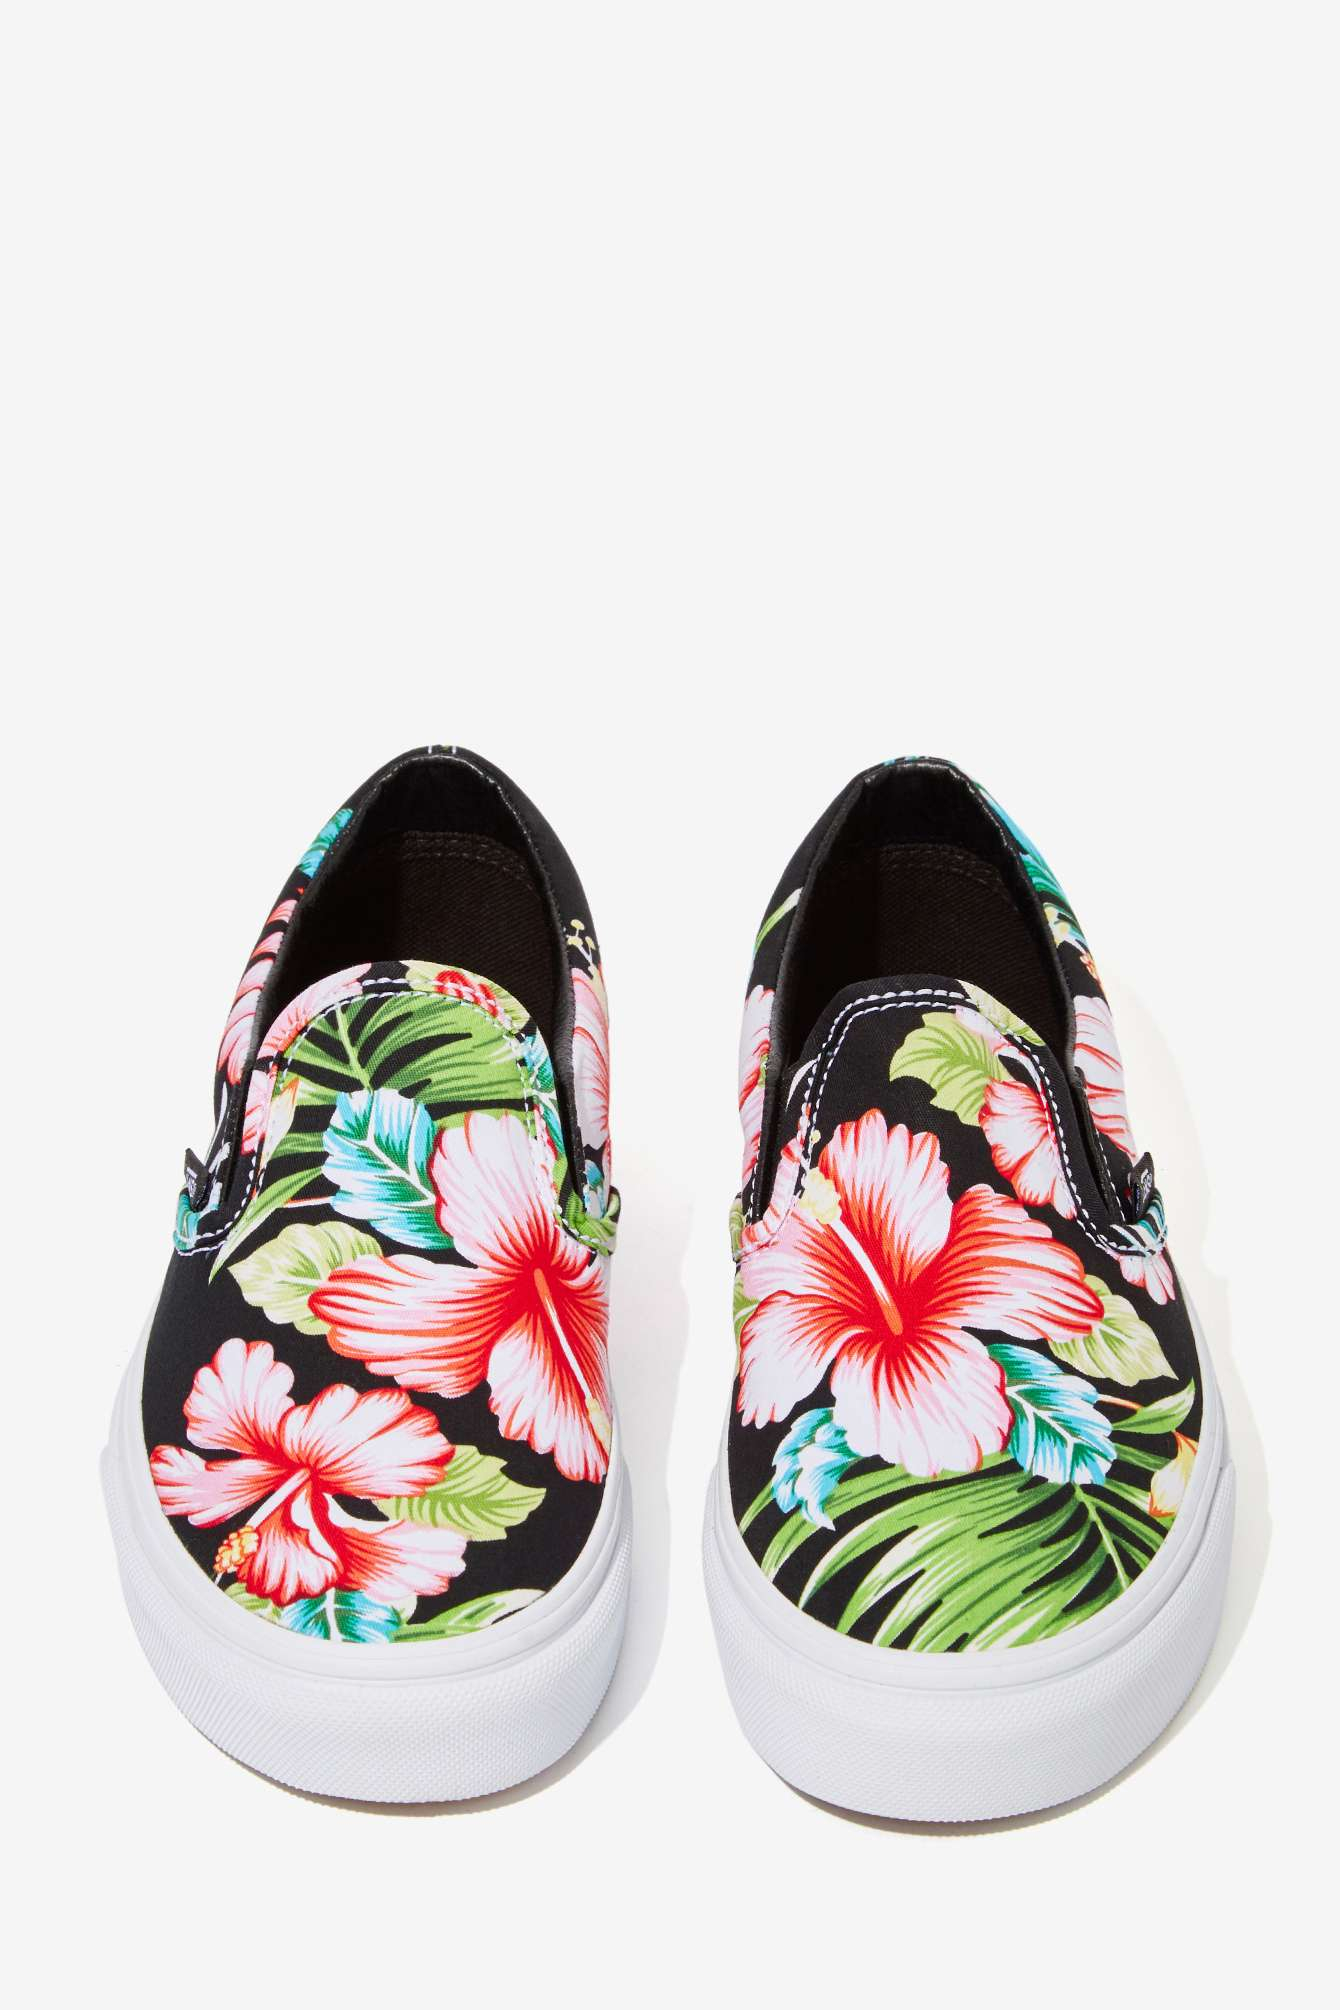 Nasty Gal Vans Classic Slip On Sneaker Black Hawaiian